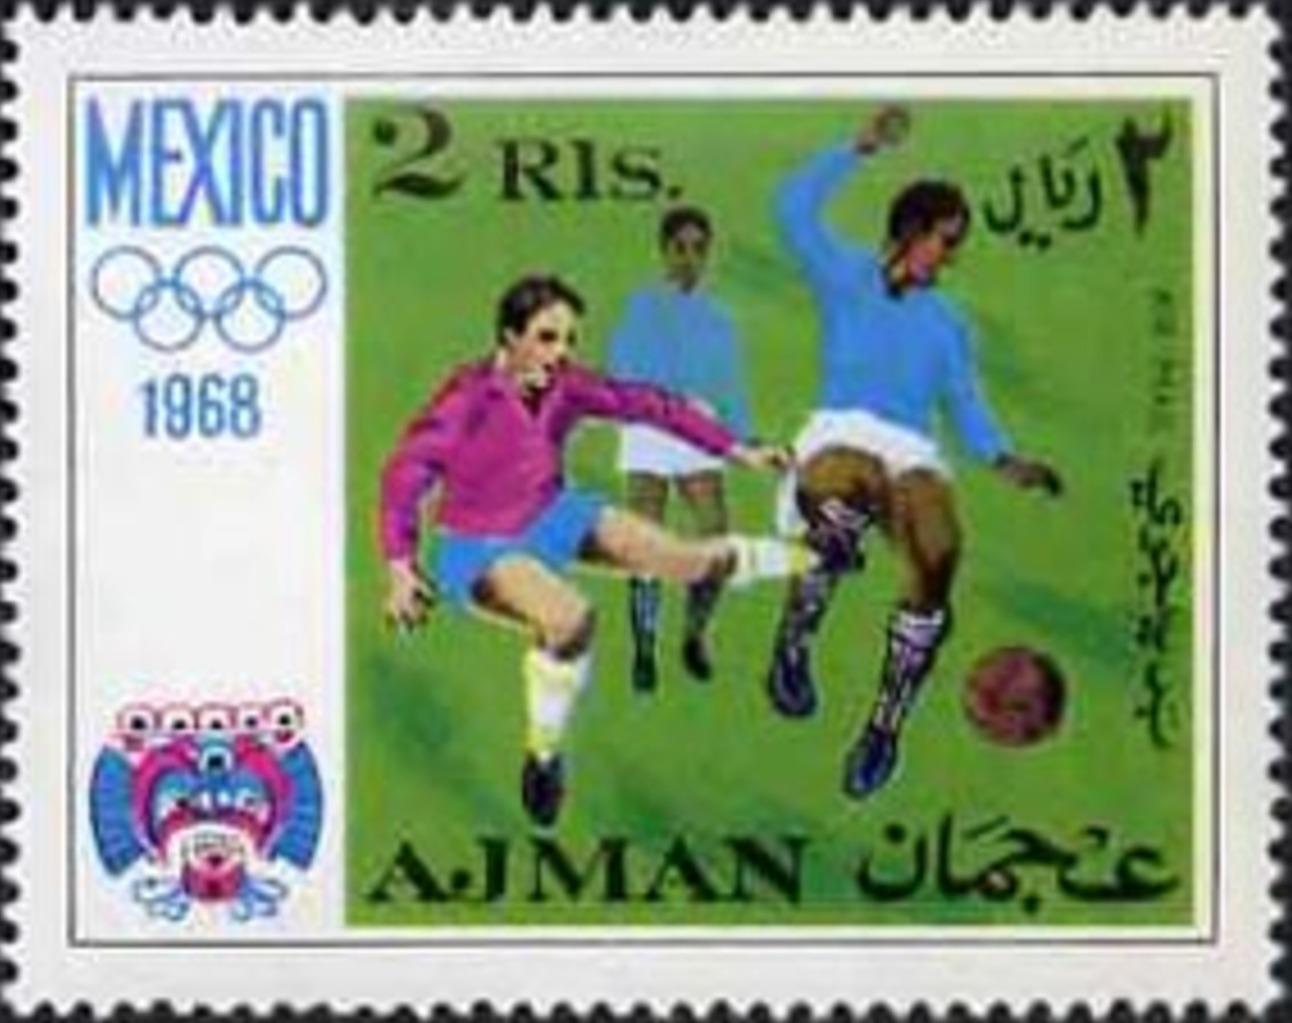 Ajman 1968 Olympic Games - Mexico e.jpg